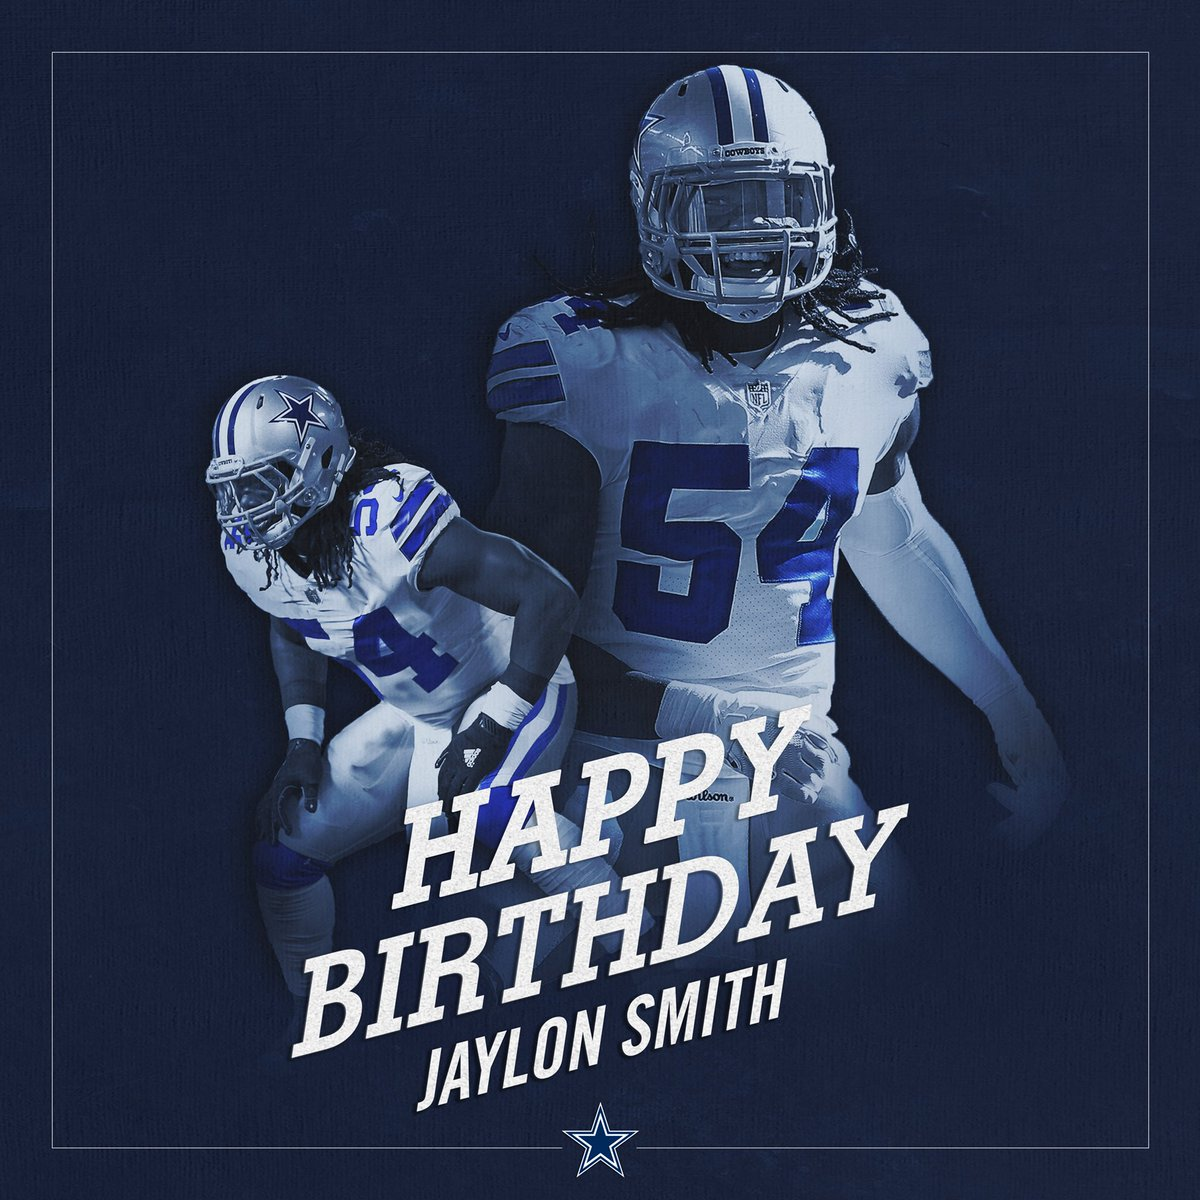 Dallas Cowboys On Twitter Cowboysnation Join Us In Wishing Thejaylonsmith A Happy Birthday